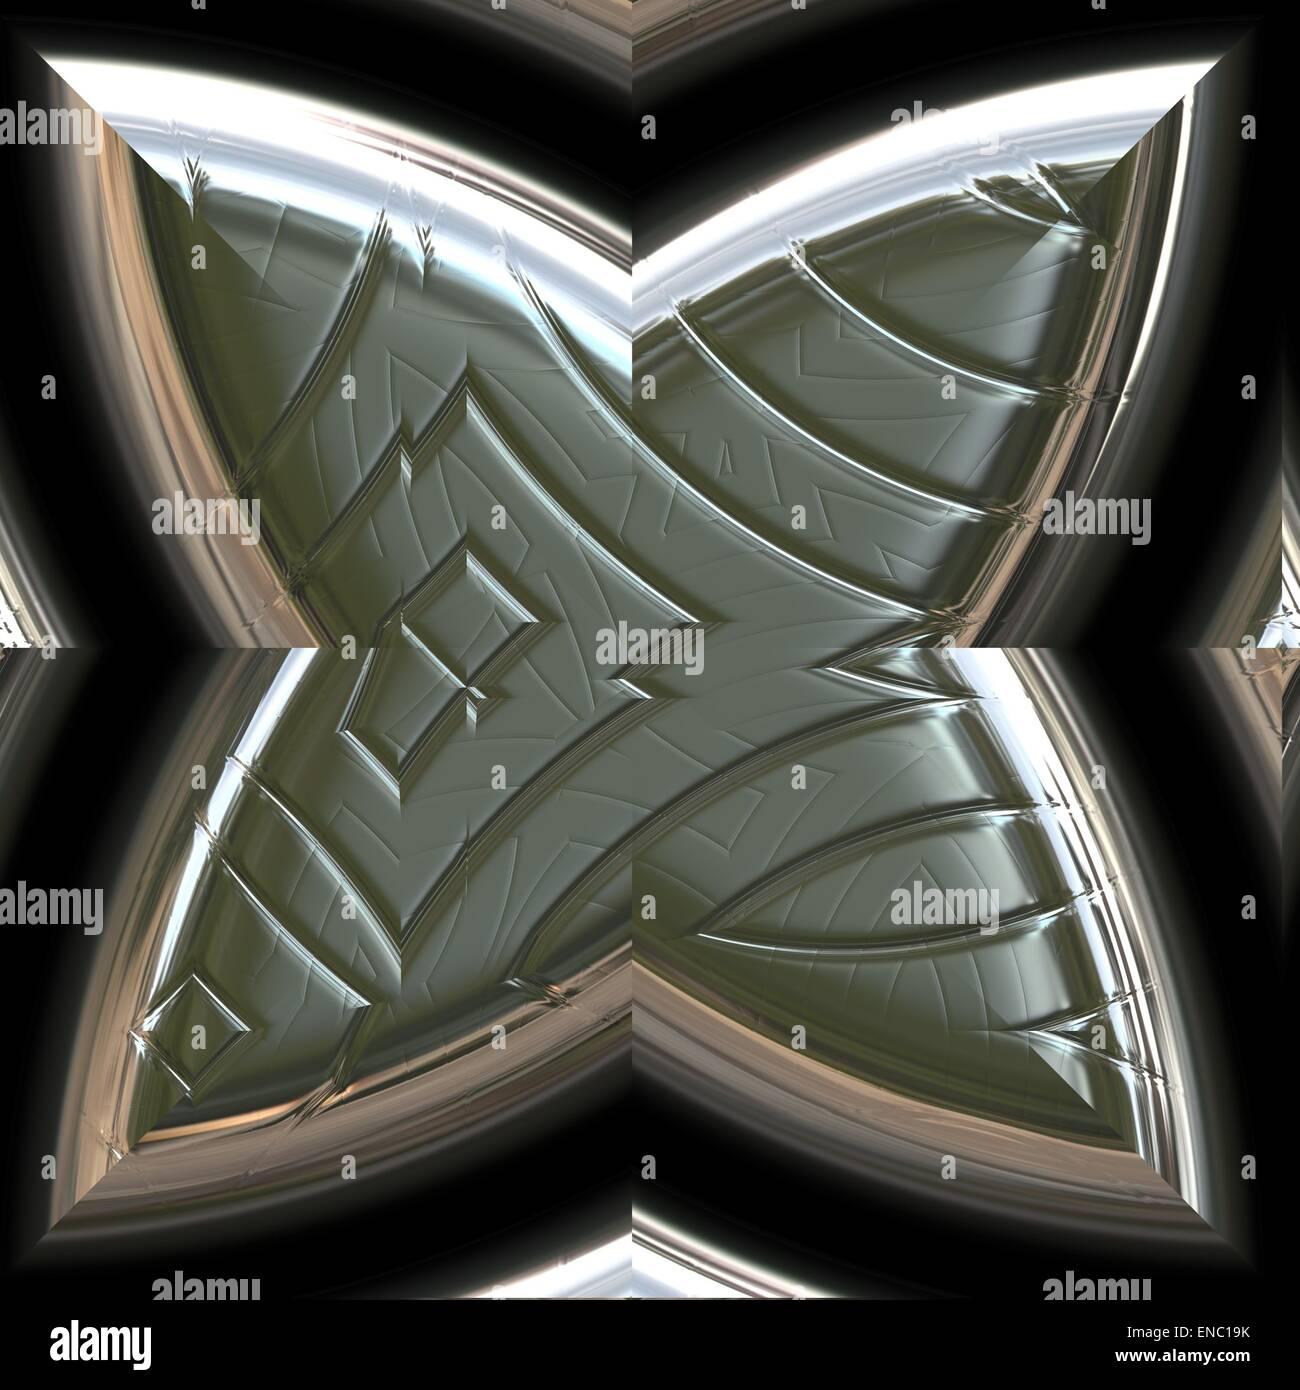 Seamless Sci-Fi background - Stock Image